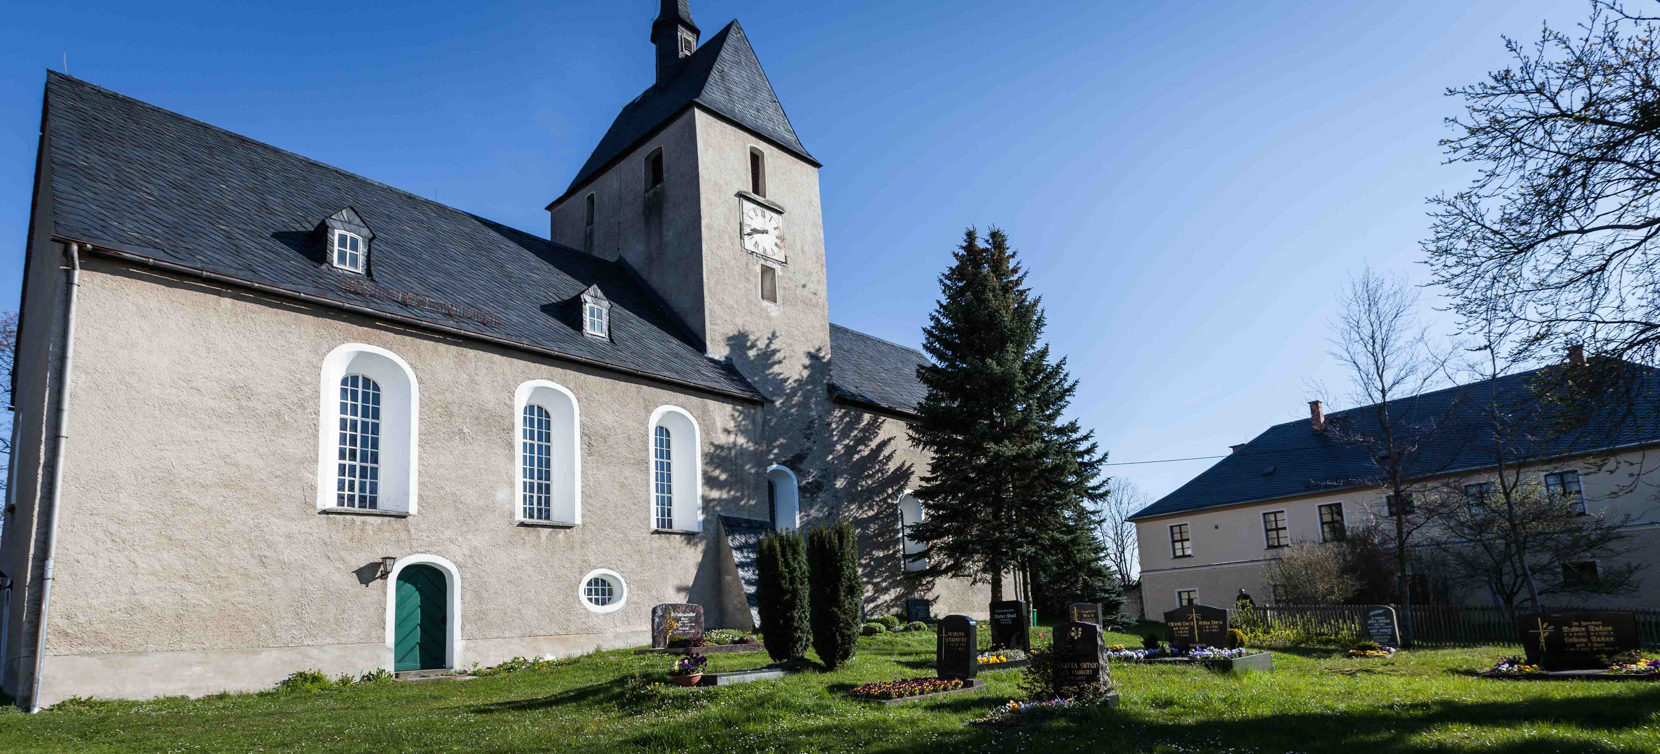 Ev.-Luth. Kirchgemeinde Thierbach-Ranspach-Langenbuch